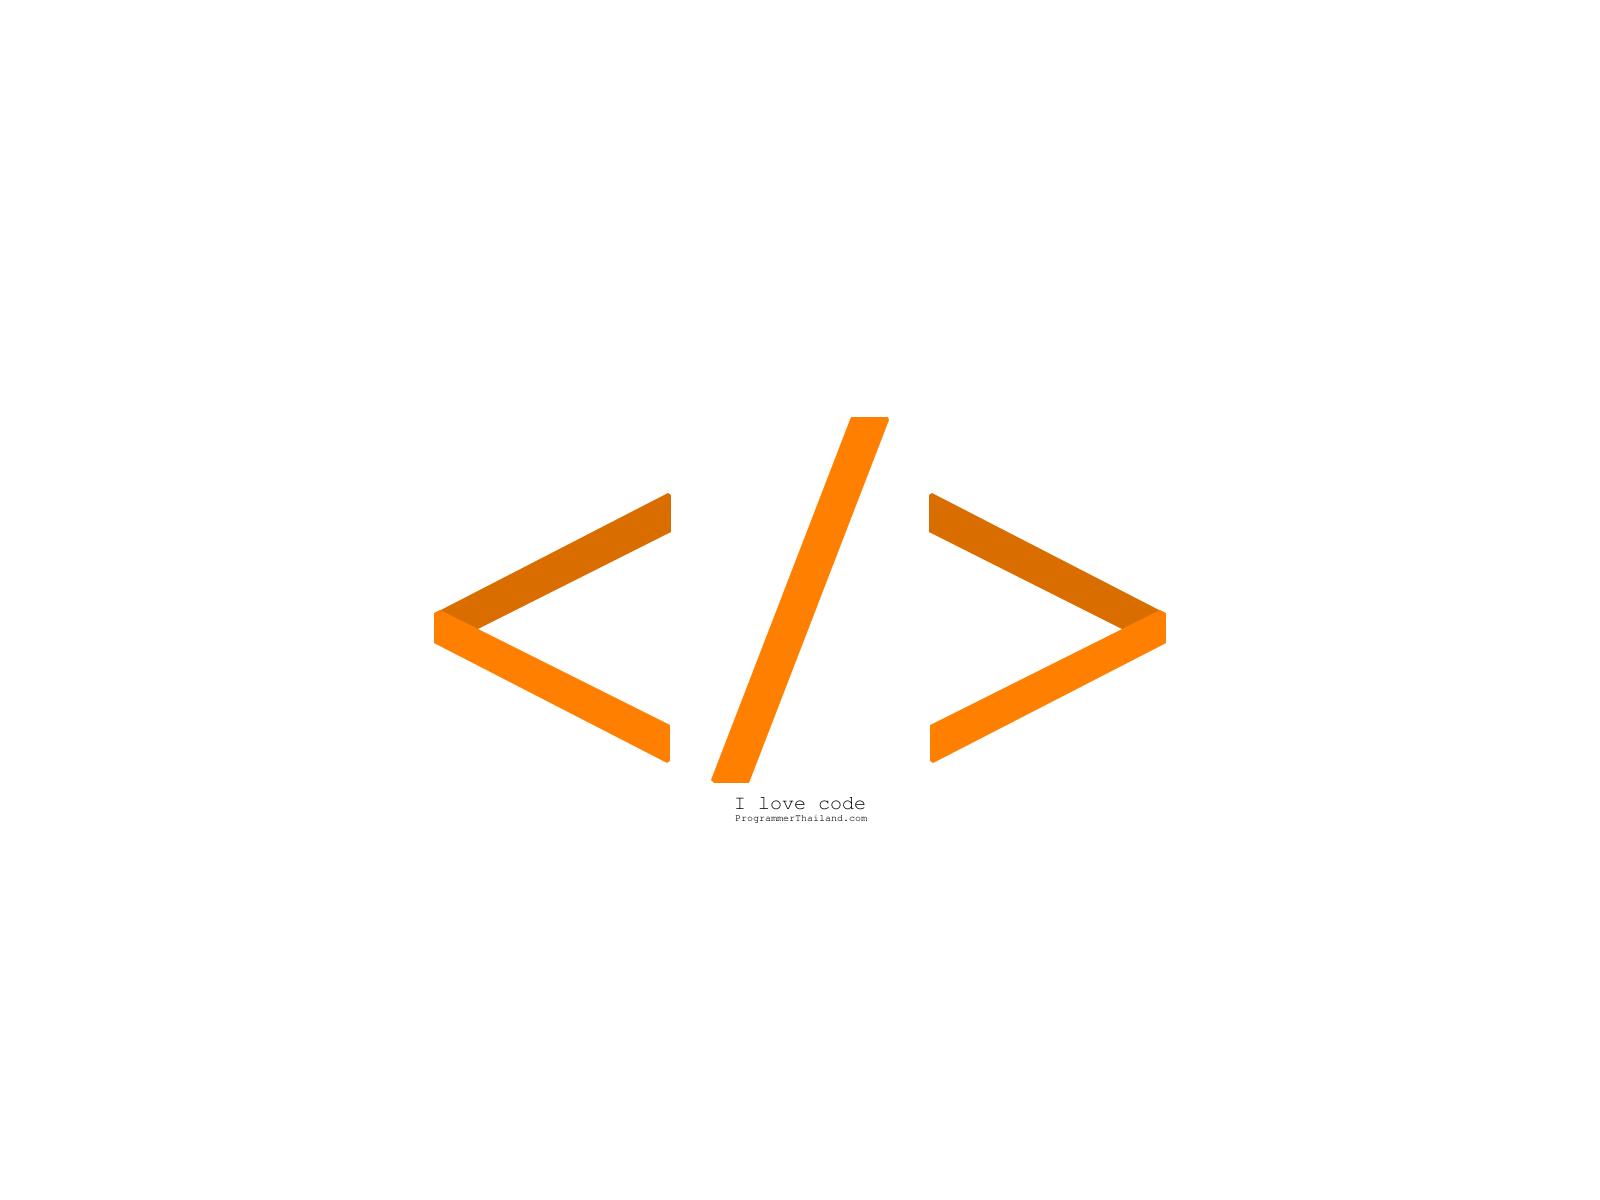 Wallpaper Programmer Thailand I Love Code